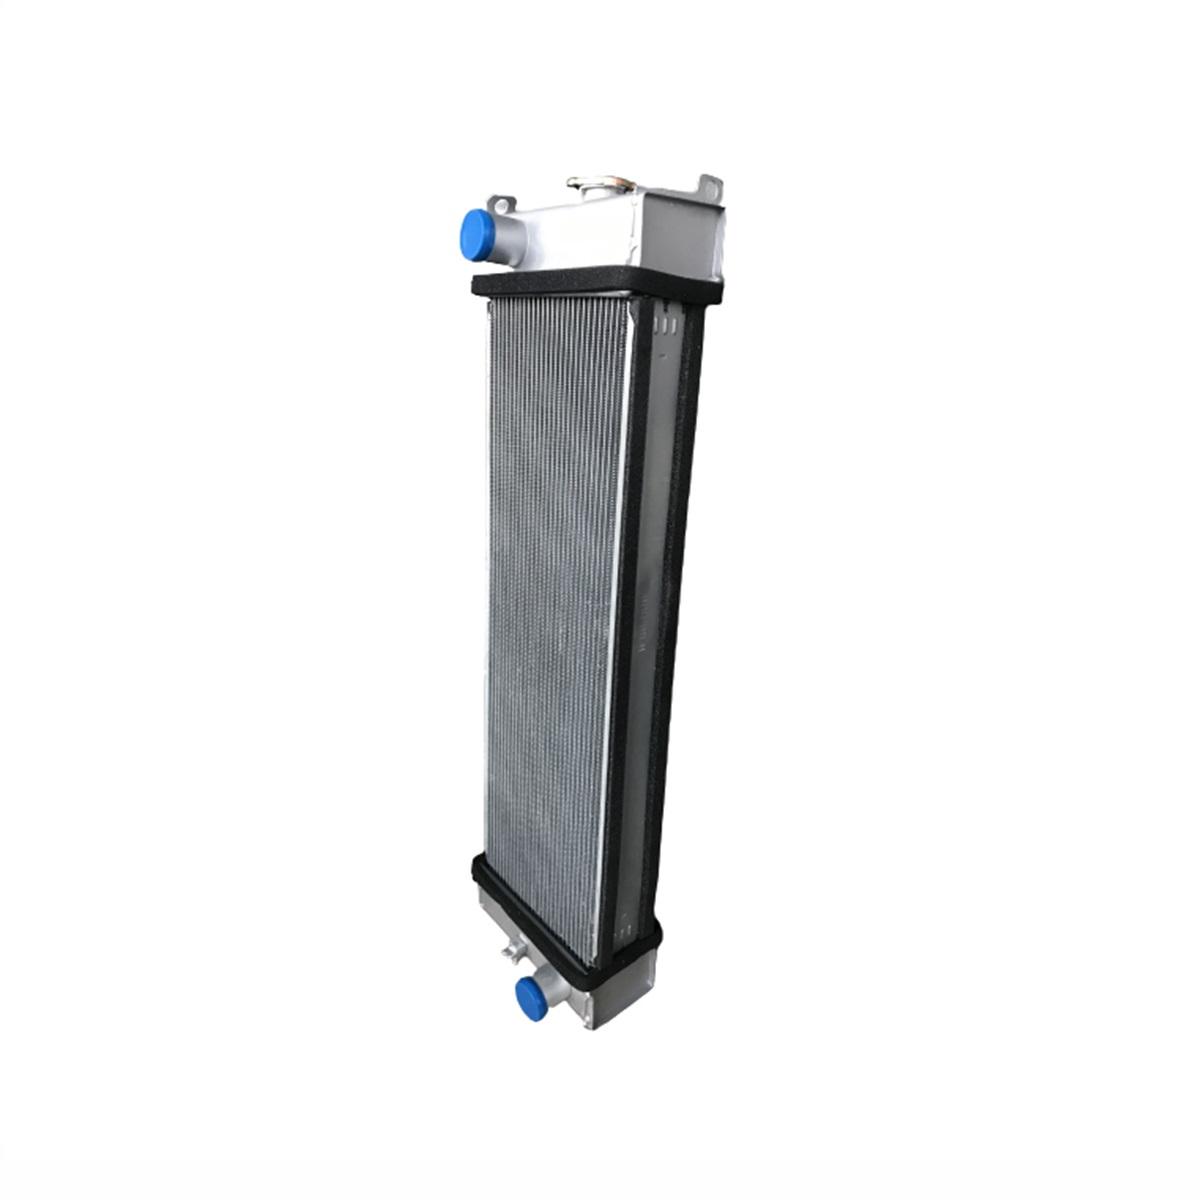 Radiador Komatsu PC160LC-7K / PC160LC-7 BLC 820x270x95